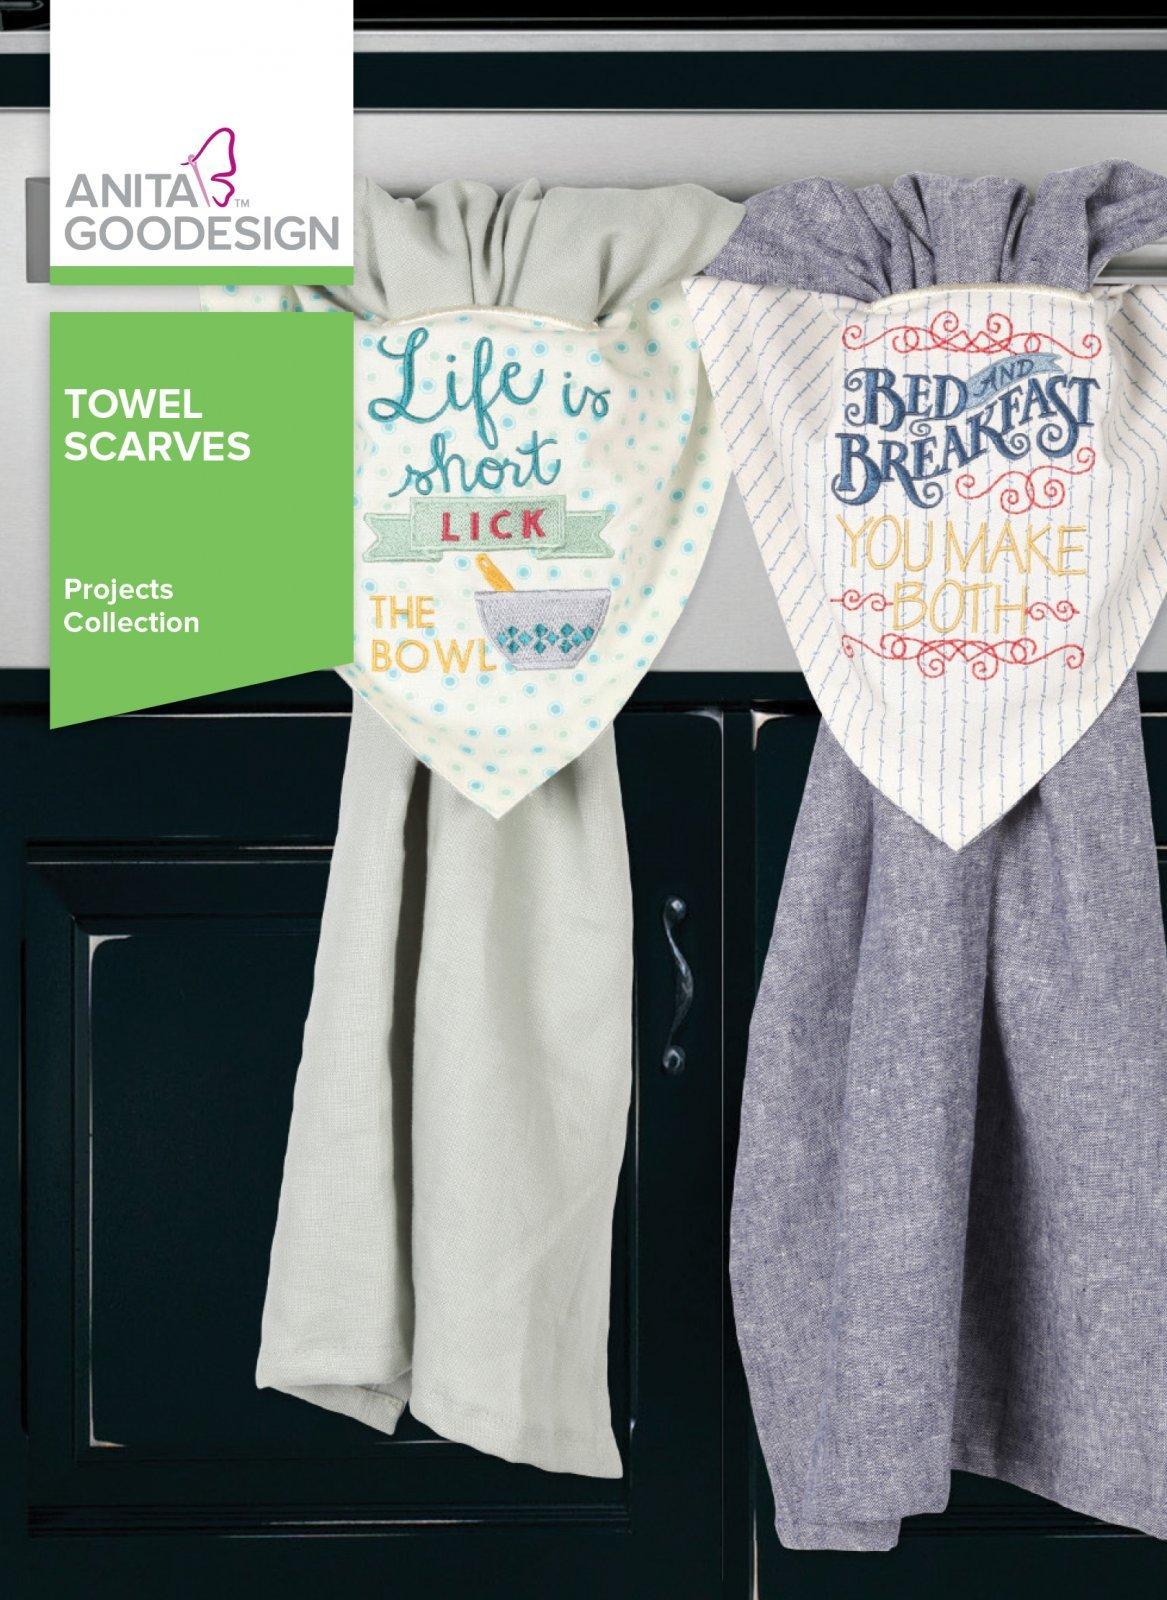 Anita Goodesign Towel Scarves